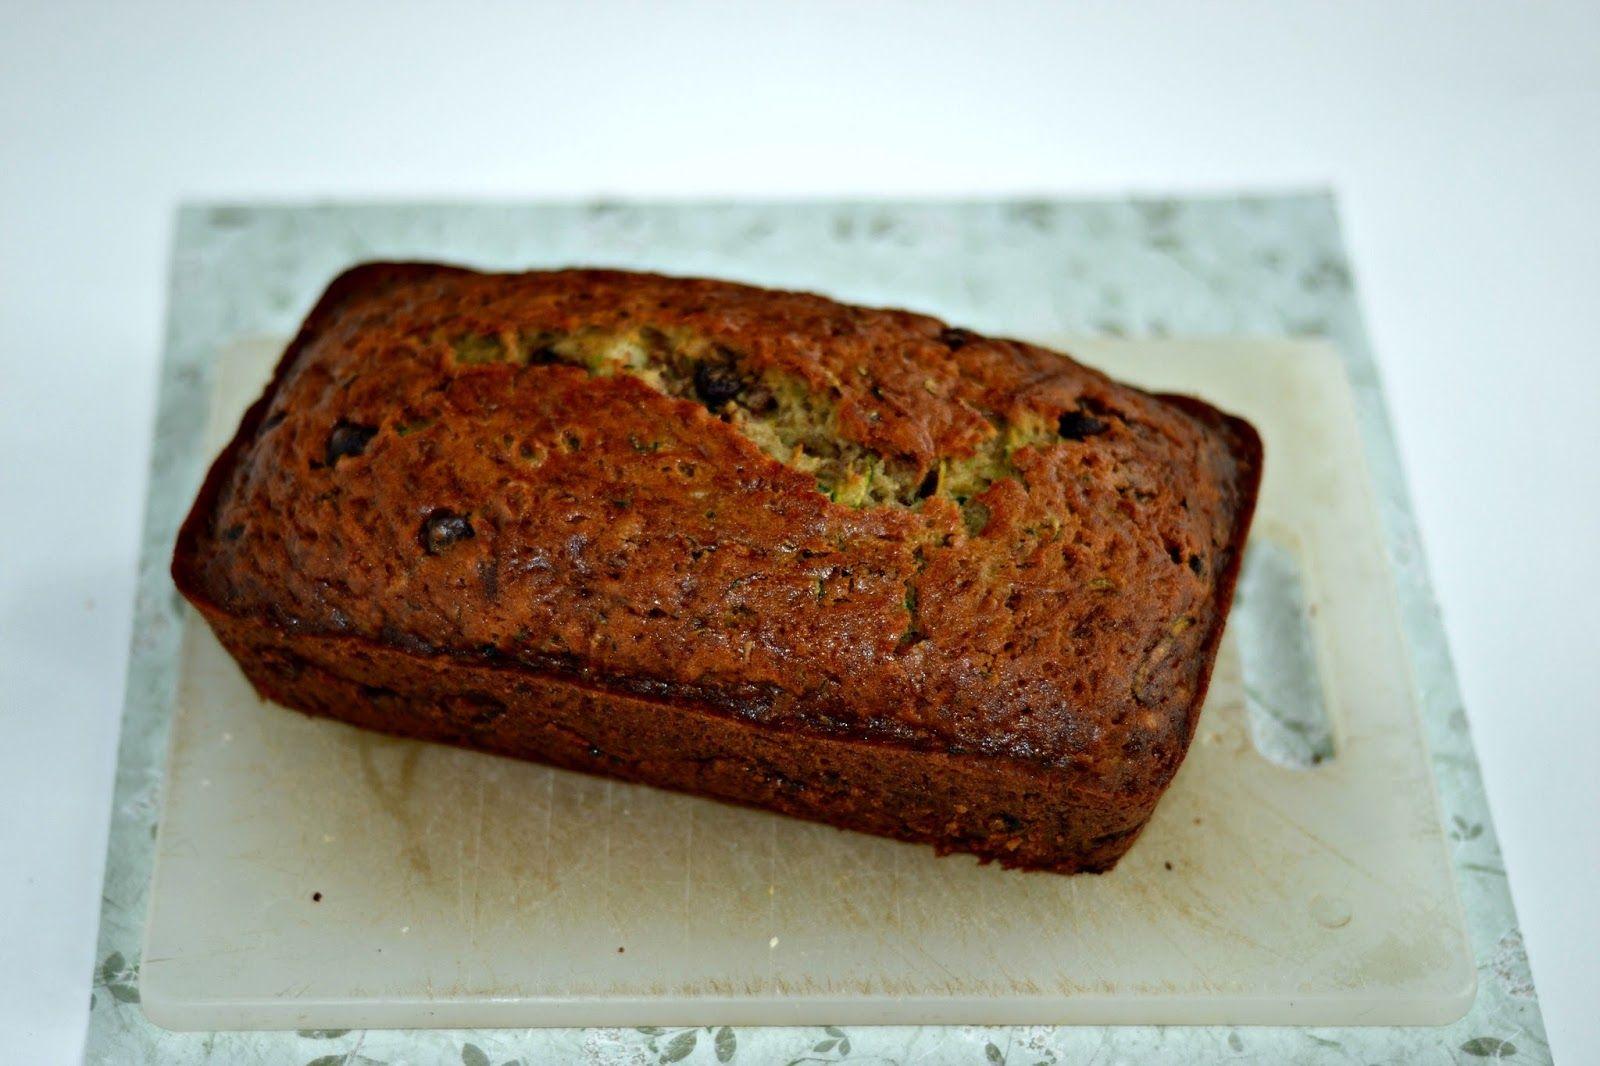 Chocolate Chip Zucchini Bread - Hezzi-D's Books and Cooks